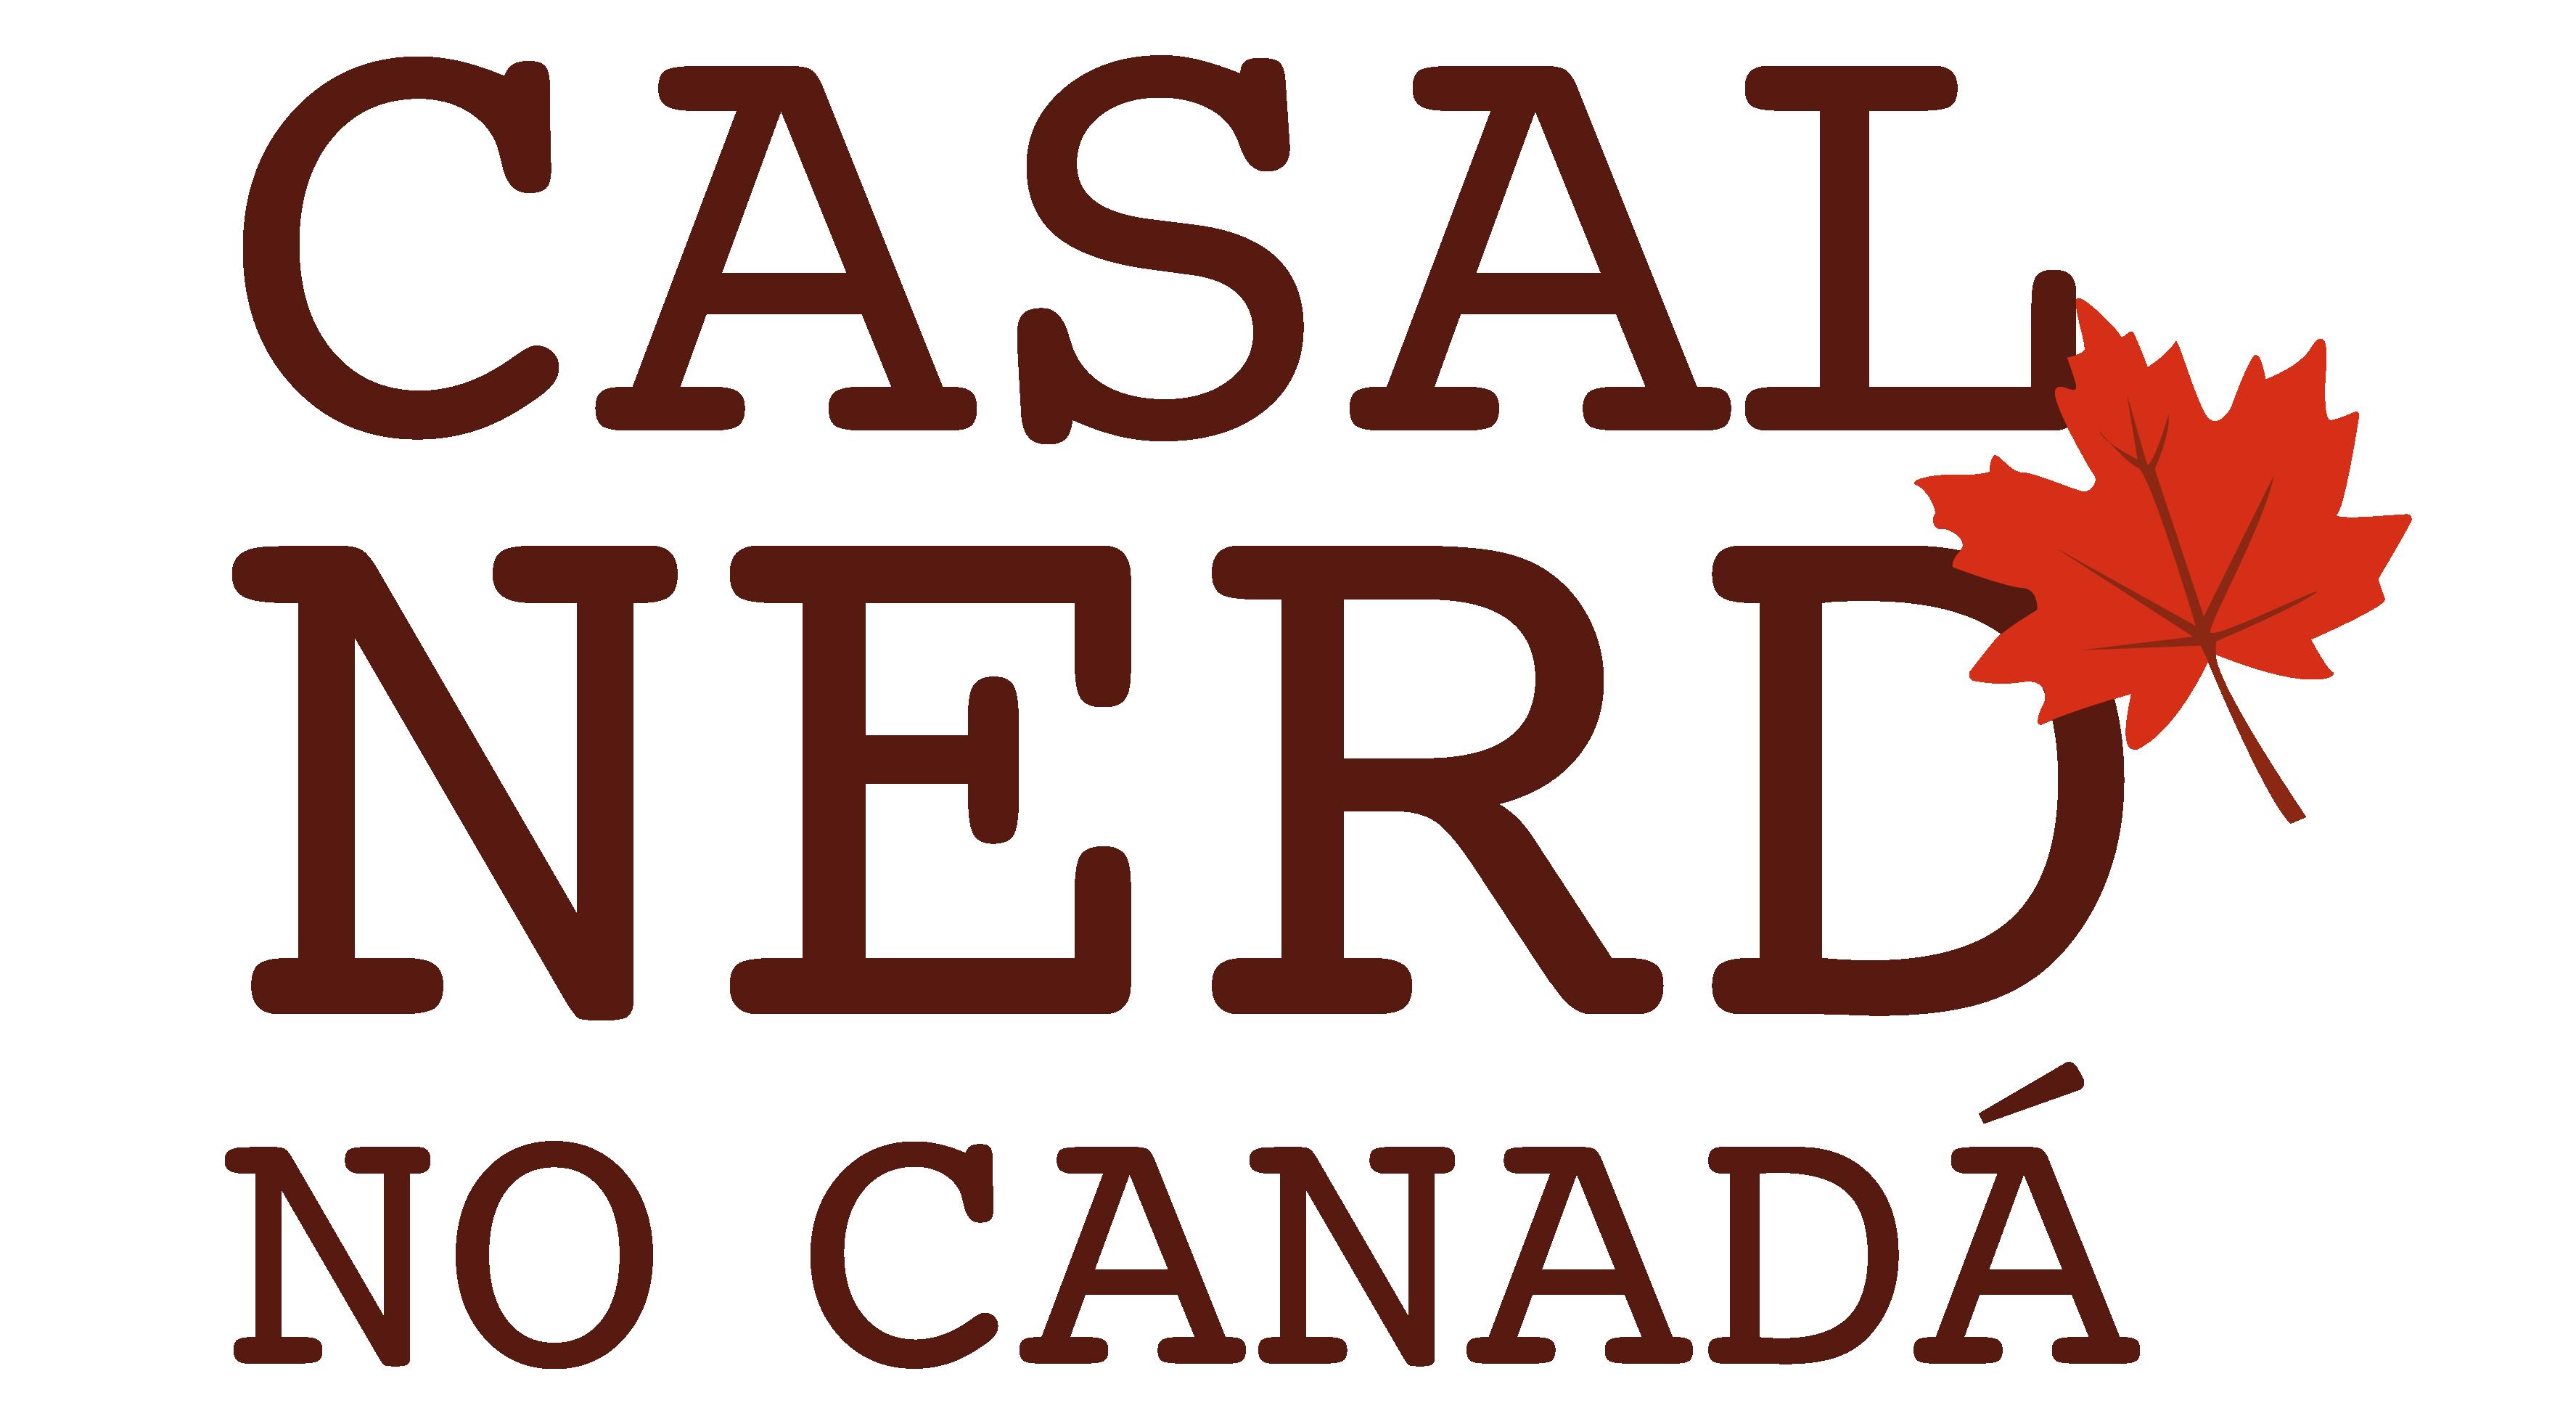 Casal Nerd no Canadá